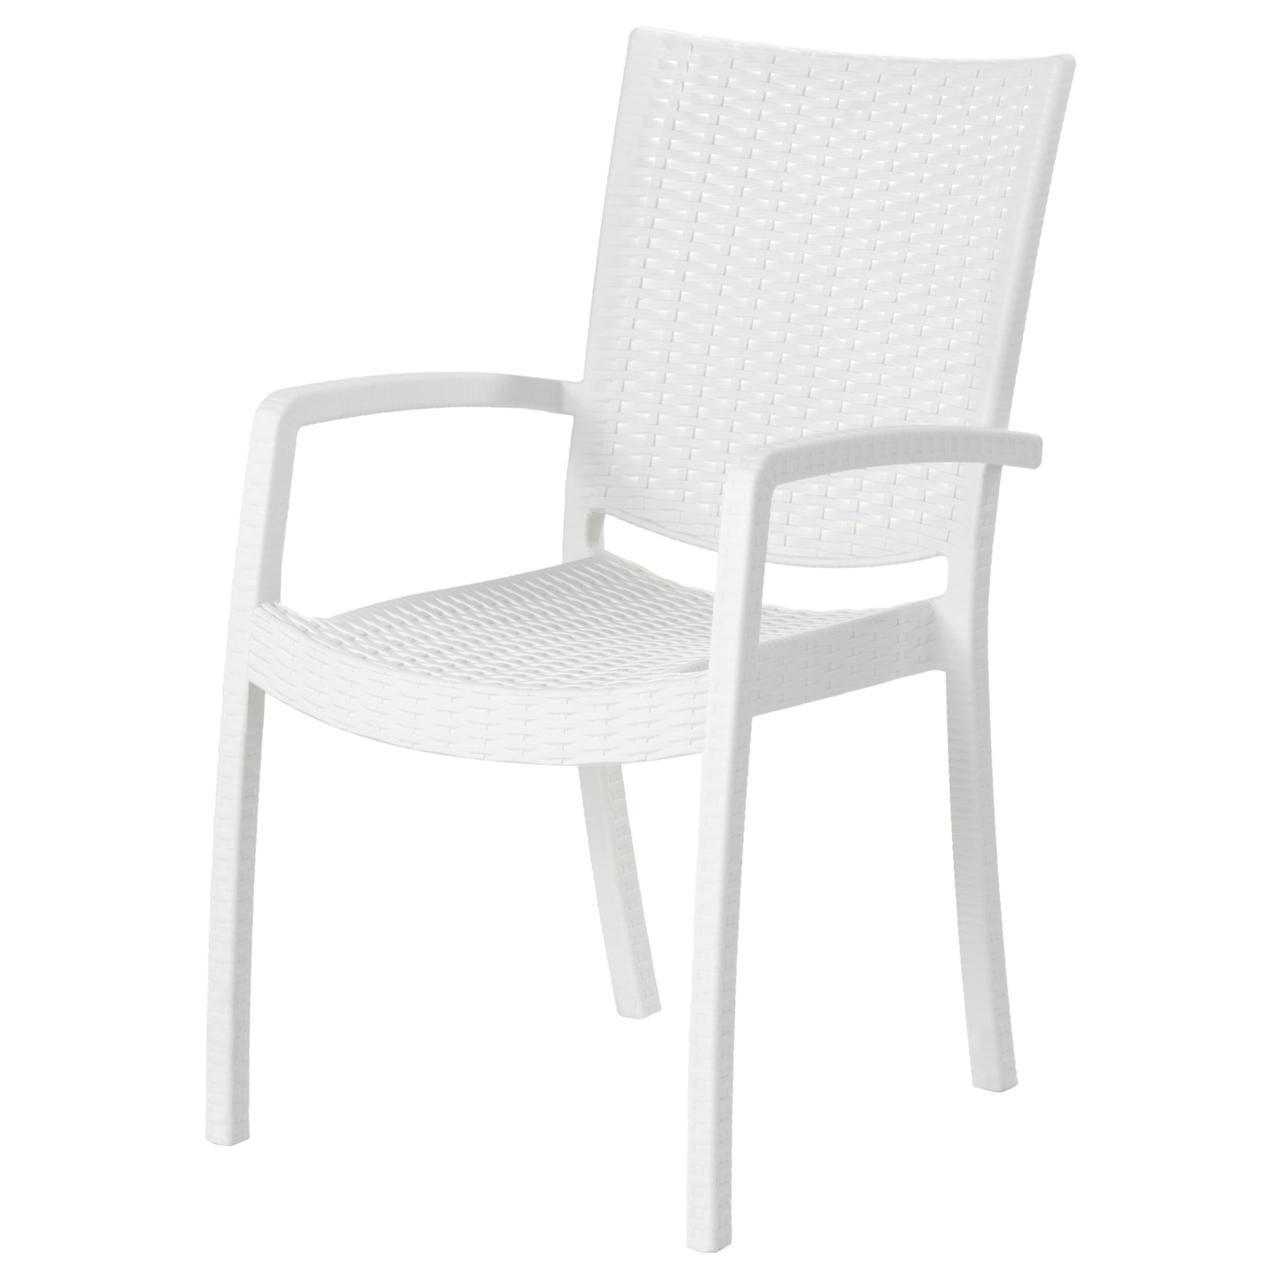 IKEA INNAMO (503.124.24) Стул с подлокотниками, орг., Белый